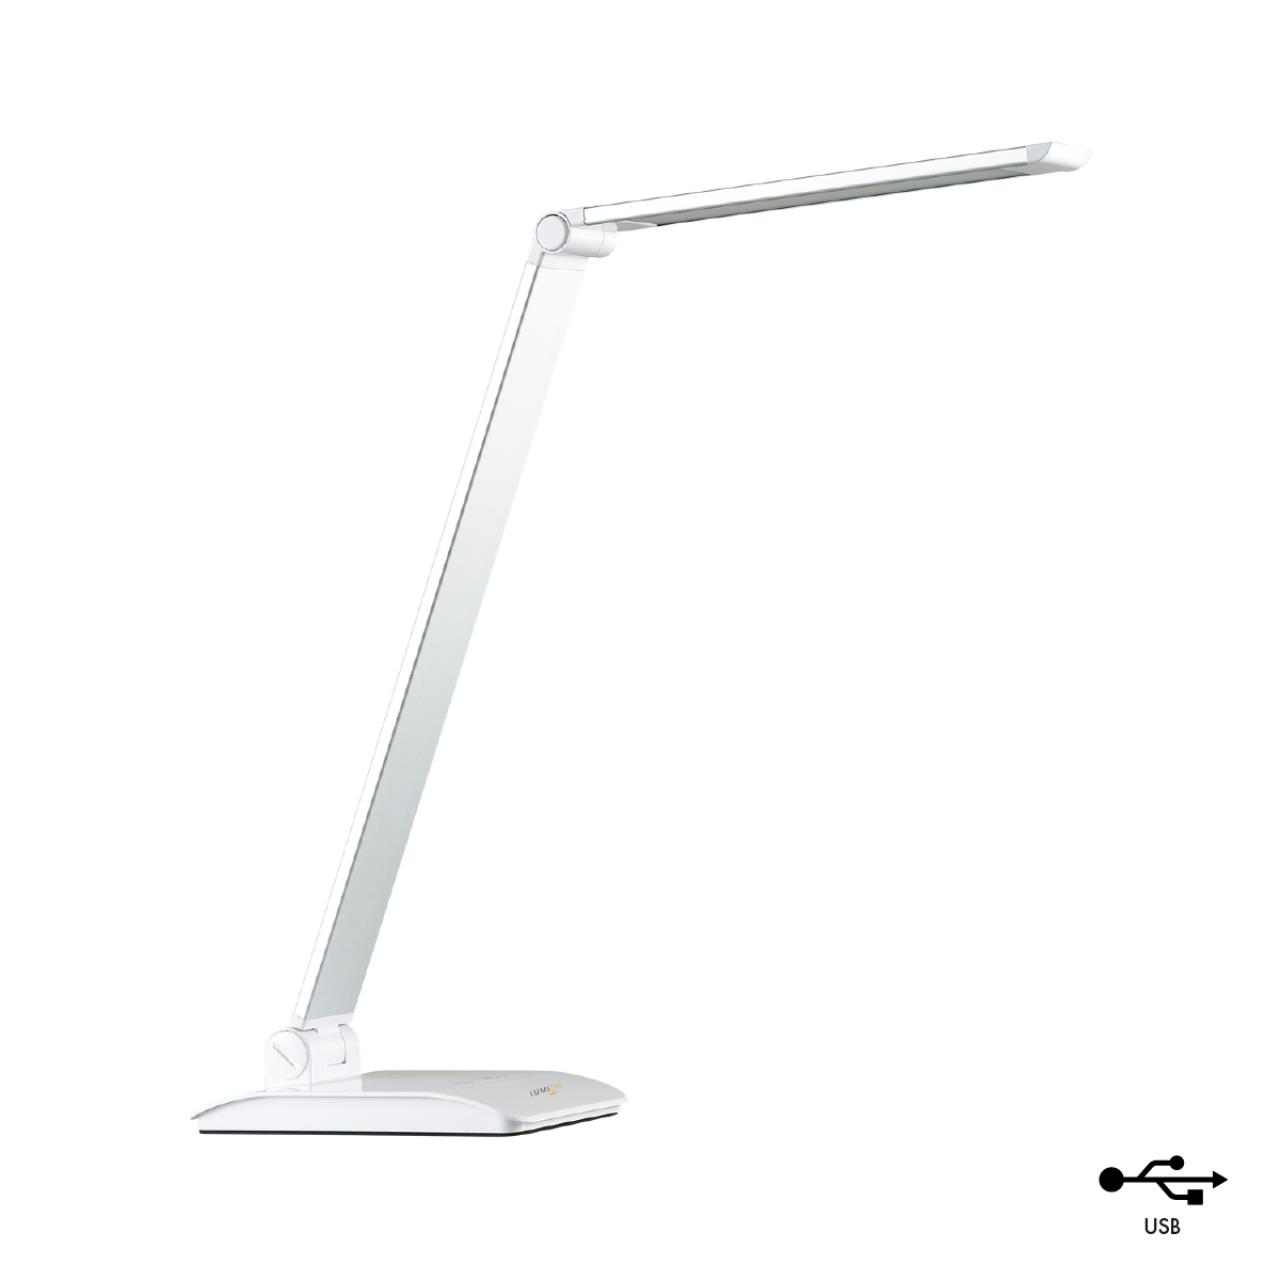 3758/7TL DESK LN19 276 белый Настольная лампа LED 7W 220V REIKO